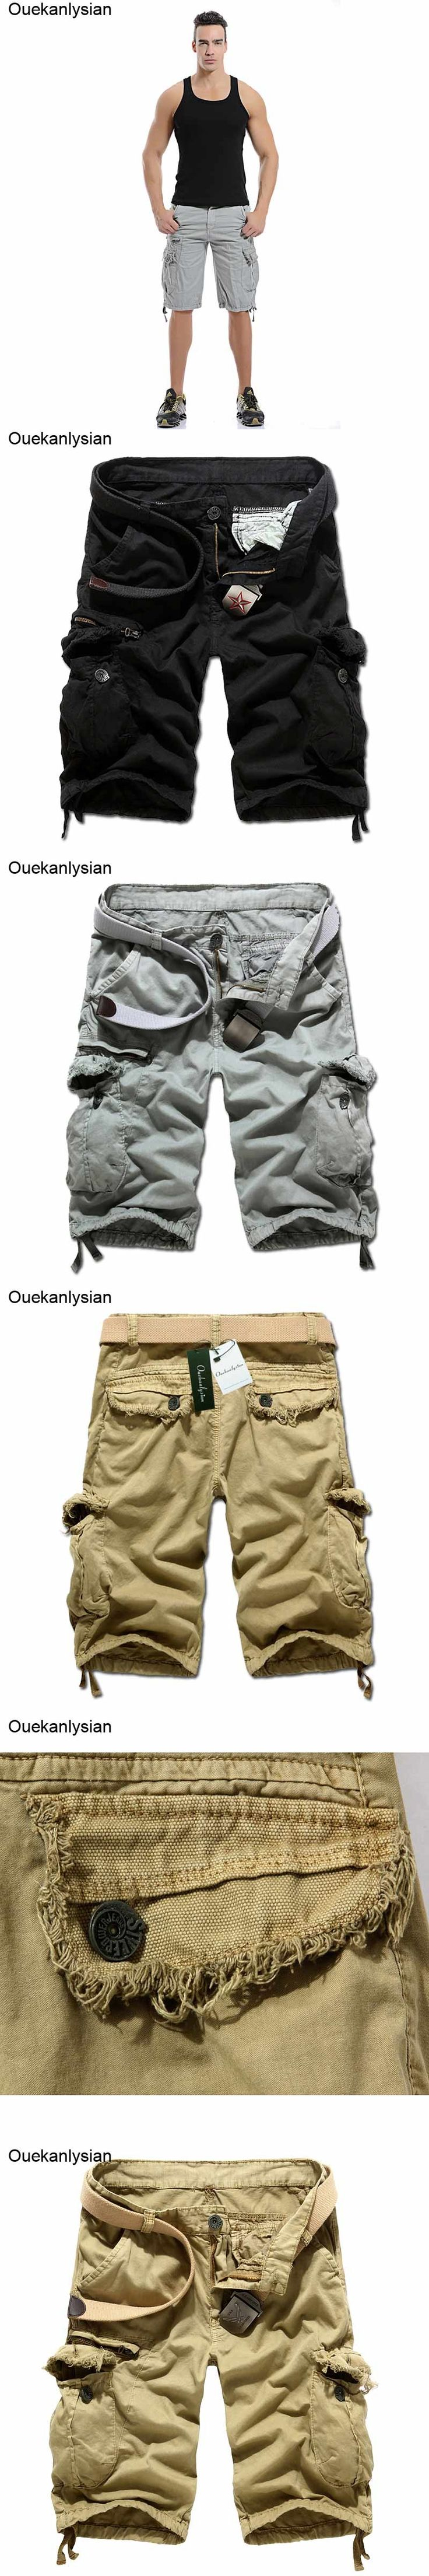 Ouekanlysian Multi Pockets Cargo Shorts Loose Casual Solid Bermuda Masculina Sportwear Overalls Pantaloncini Uomo Mma Shorts